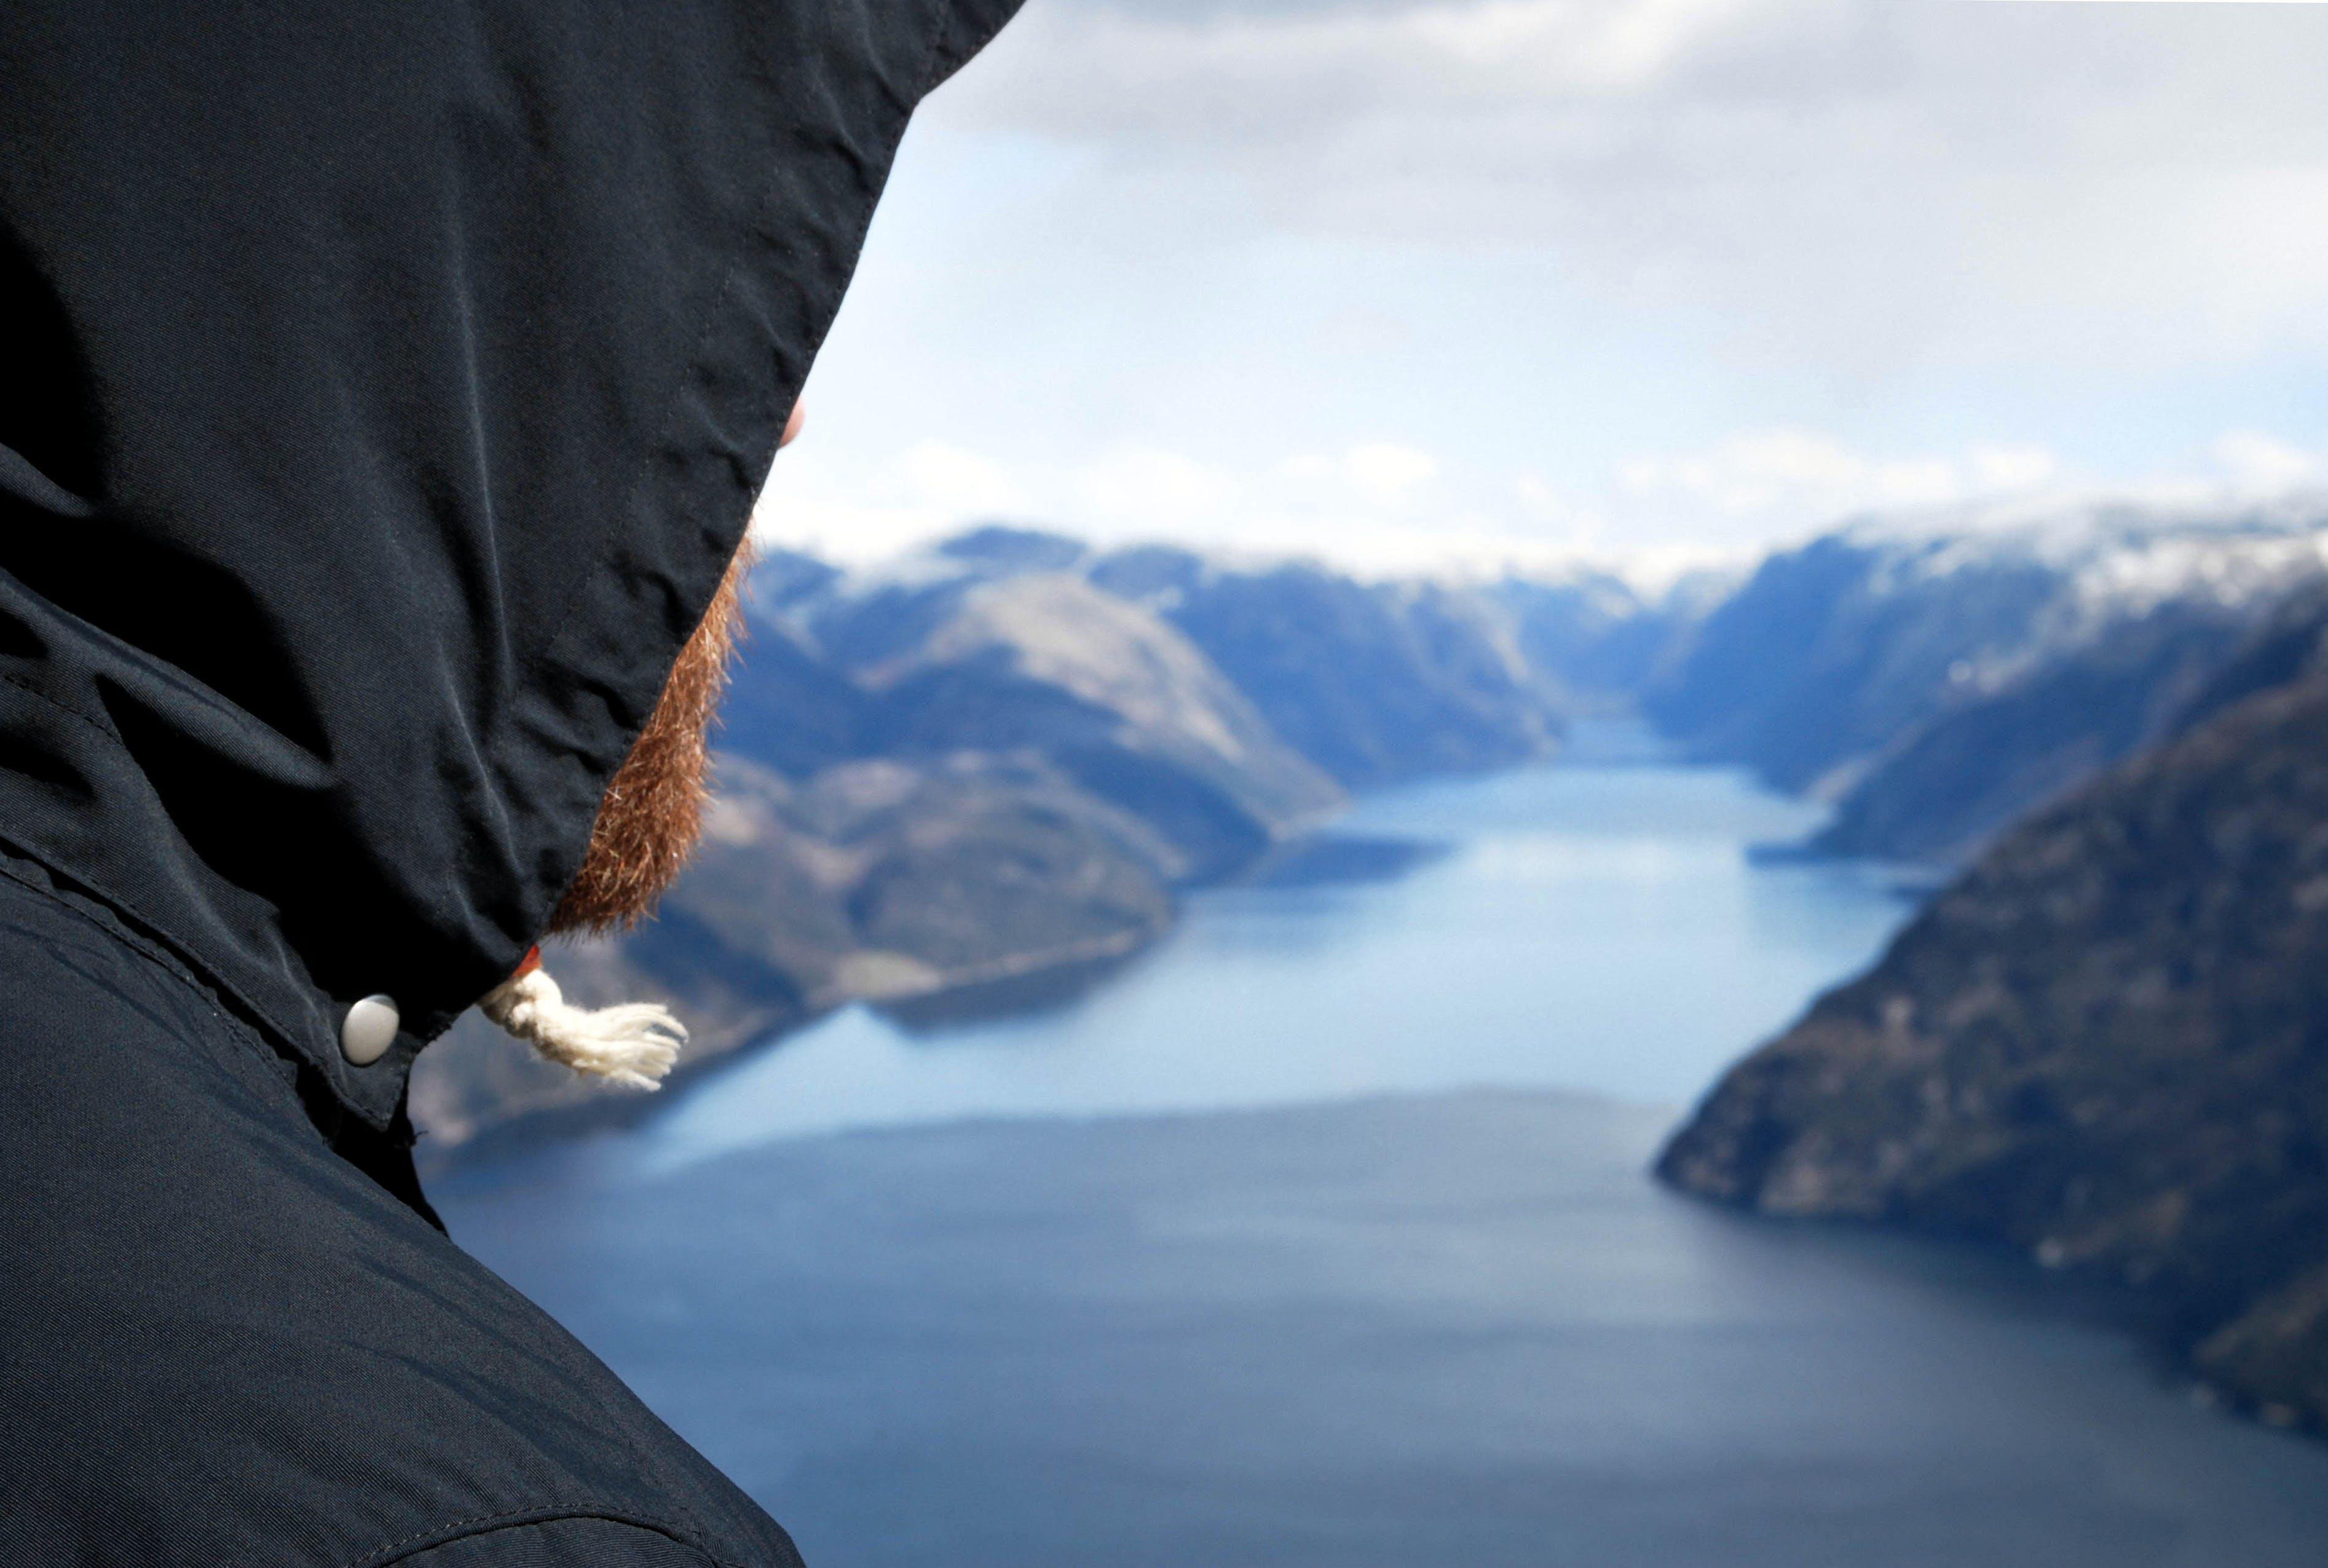 Fotos de stock gratuitas de agua, alpinista, ascender, cielo